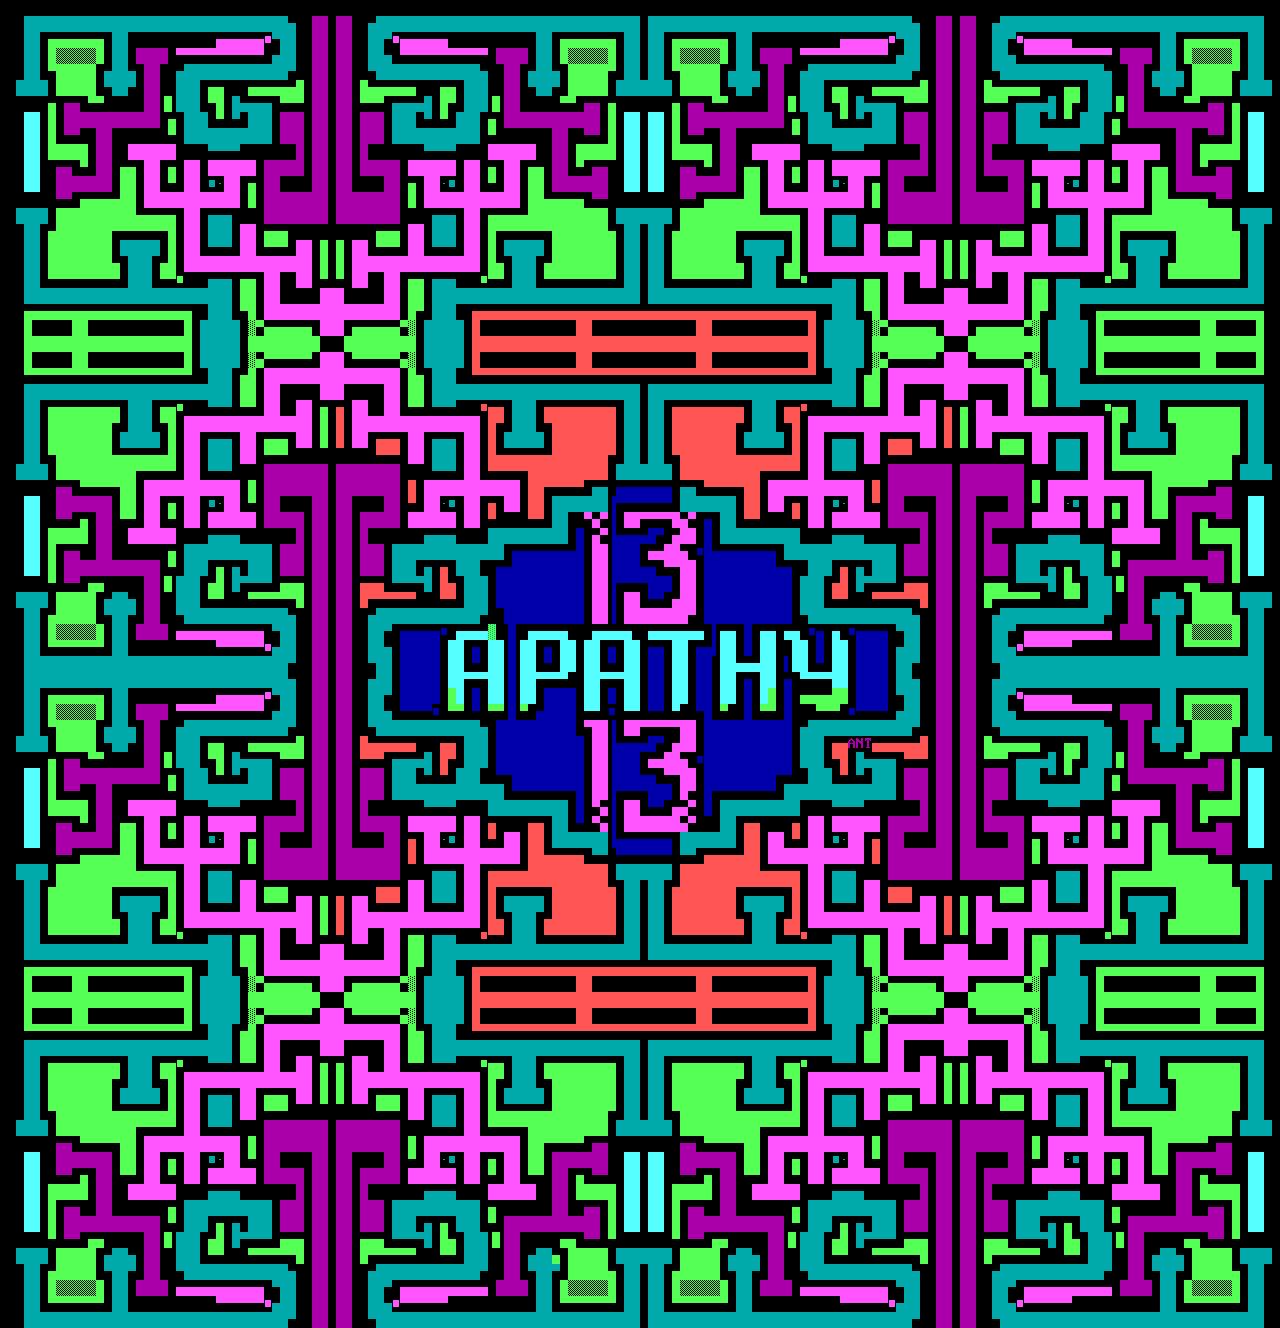 ant-apatternthy.xb